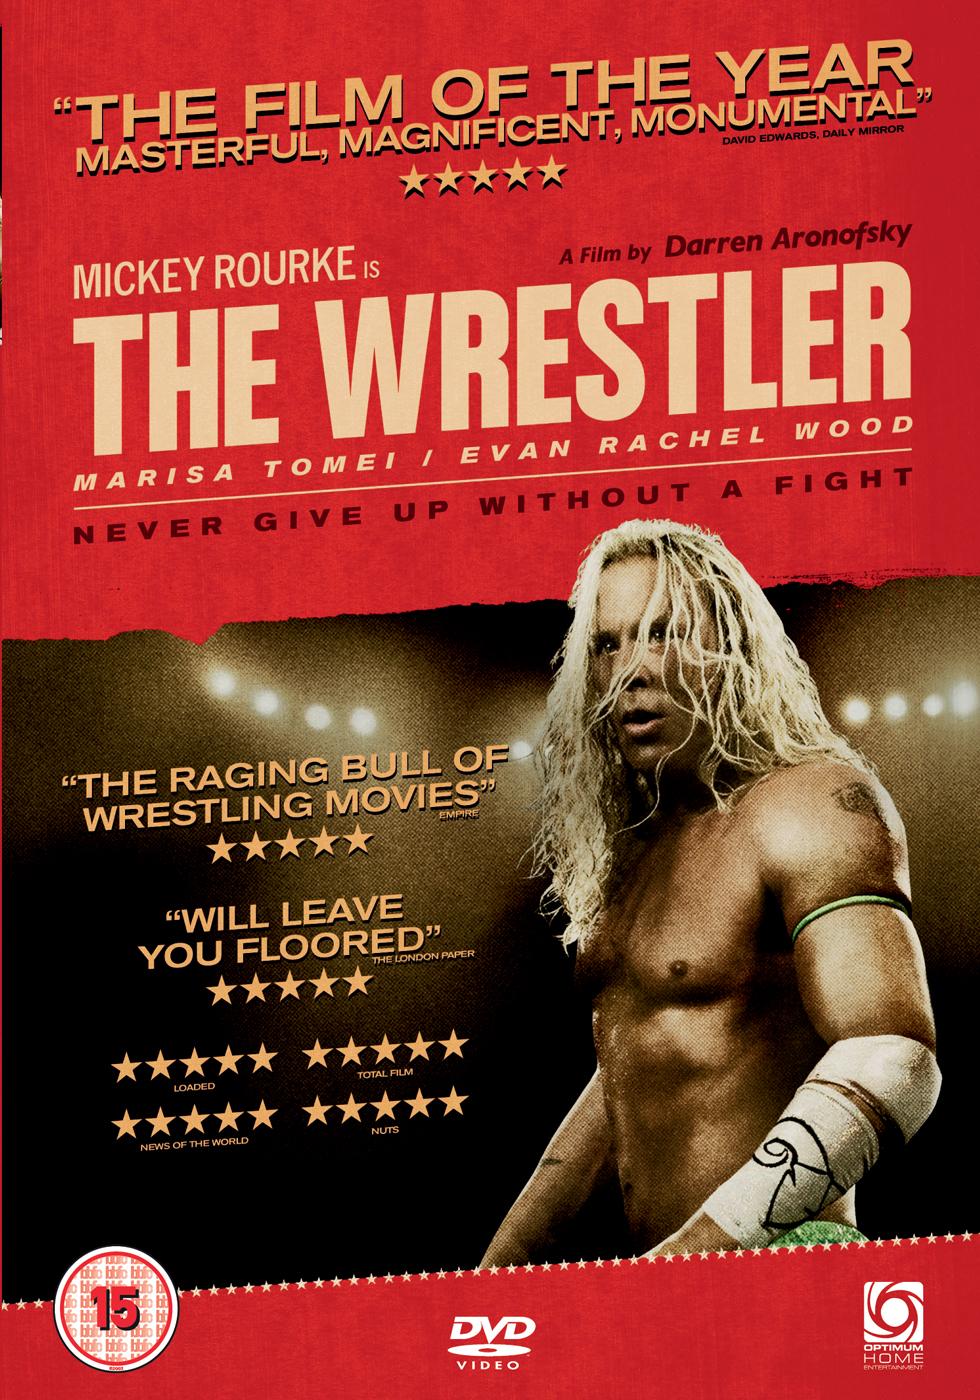 [EX-RENTAL] The Wrestler (Original)